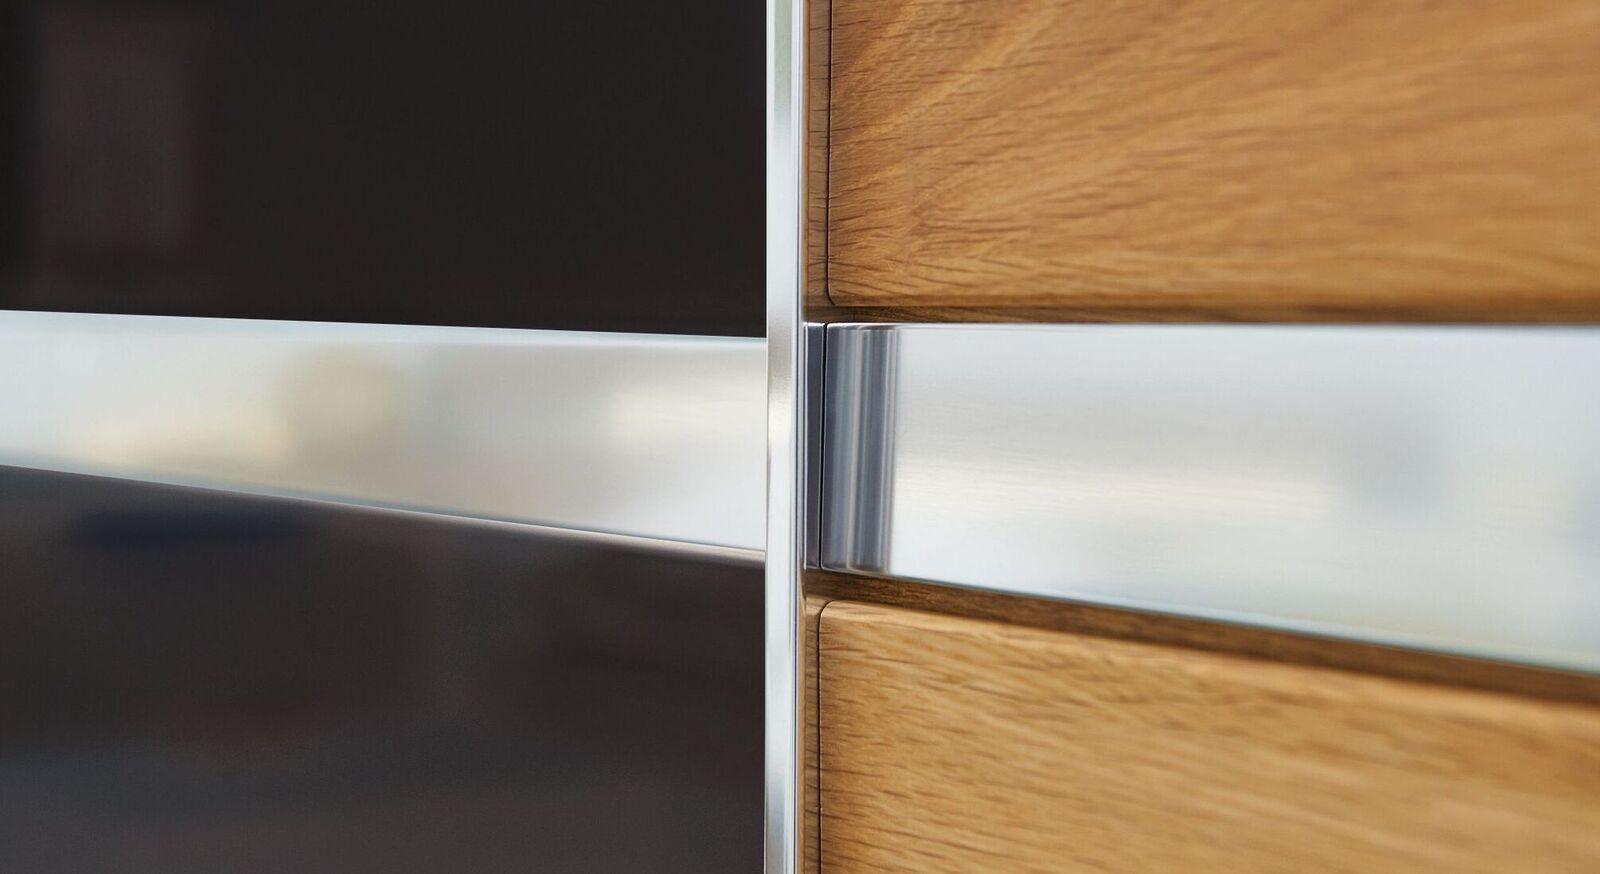 MUSTERRING Schwebetüren-Kleiderschrank Savona Graphit in angesagtem Materialmix